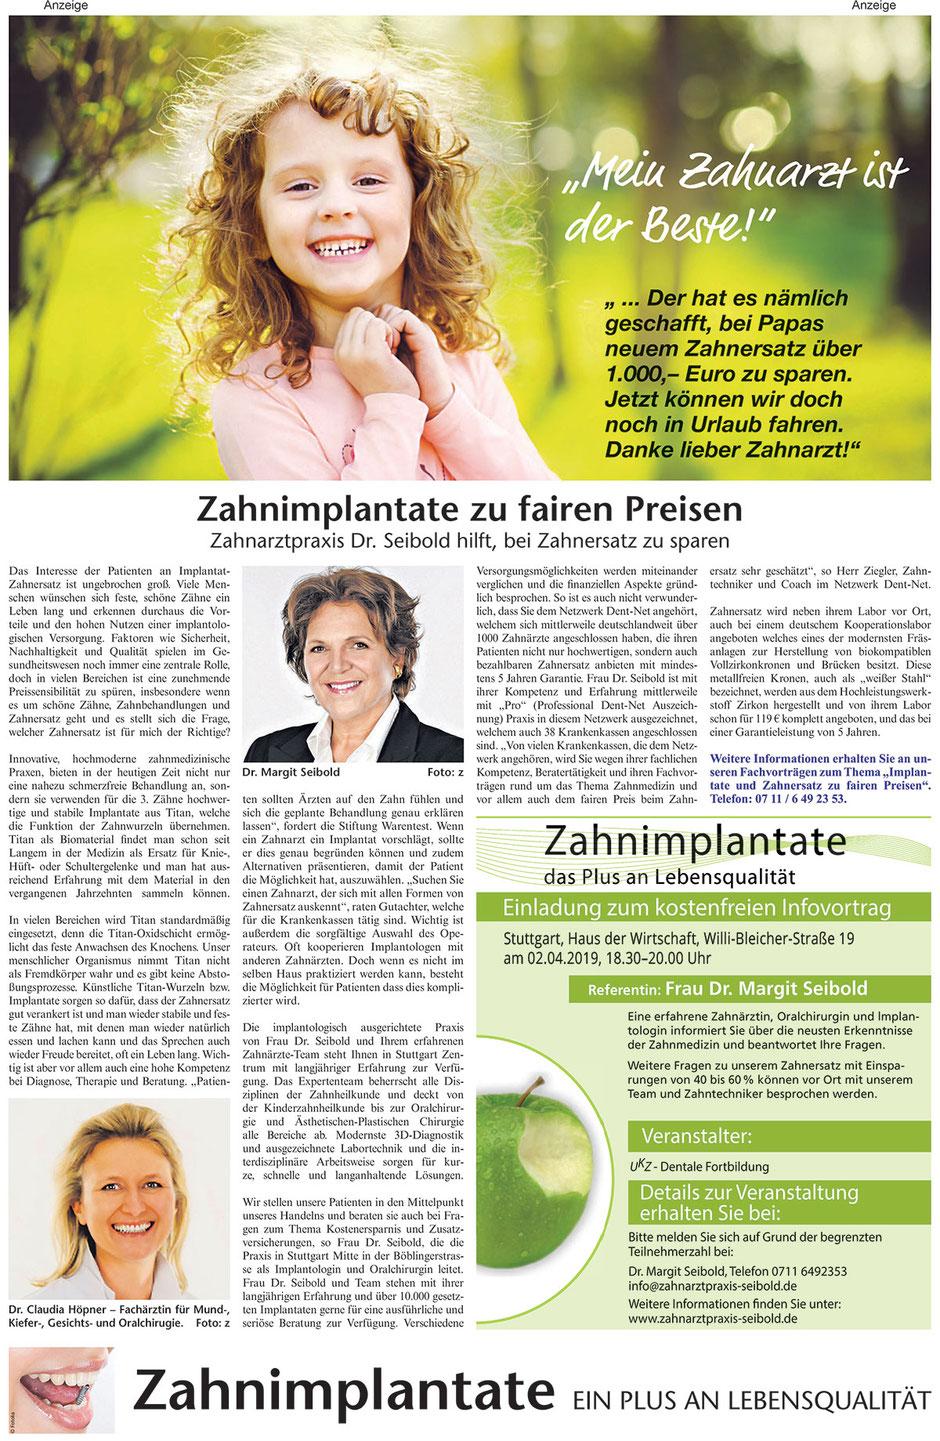 Aktueller Bericht in der Stuttgarter Zeitung